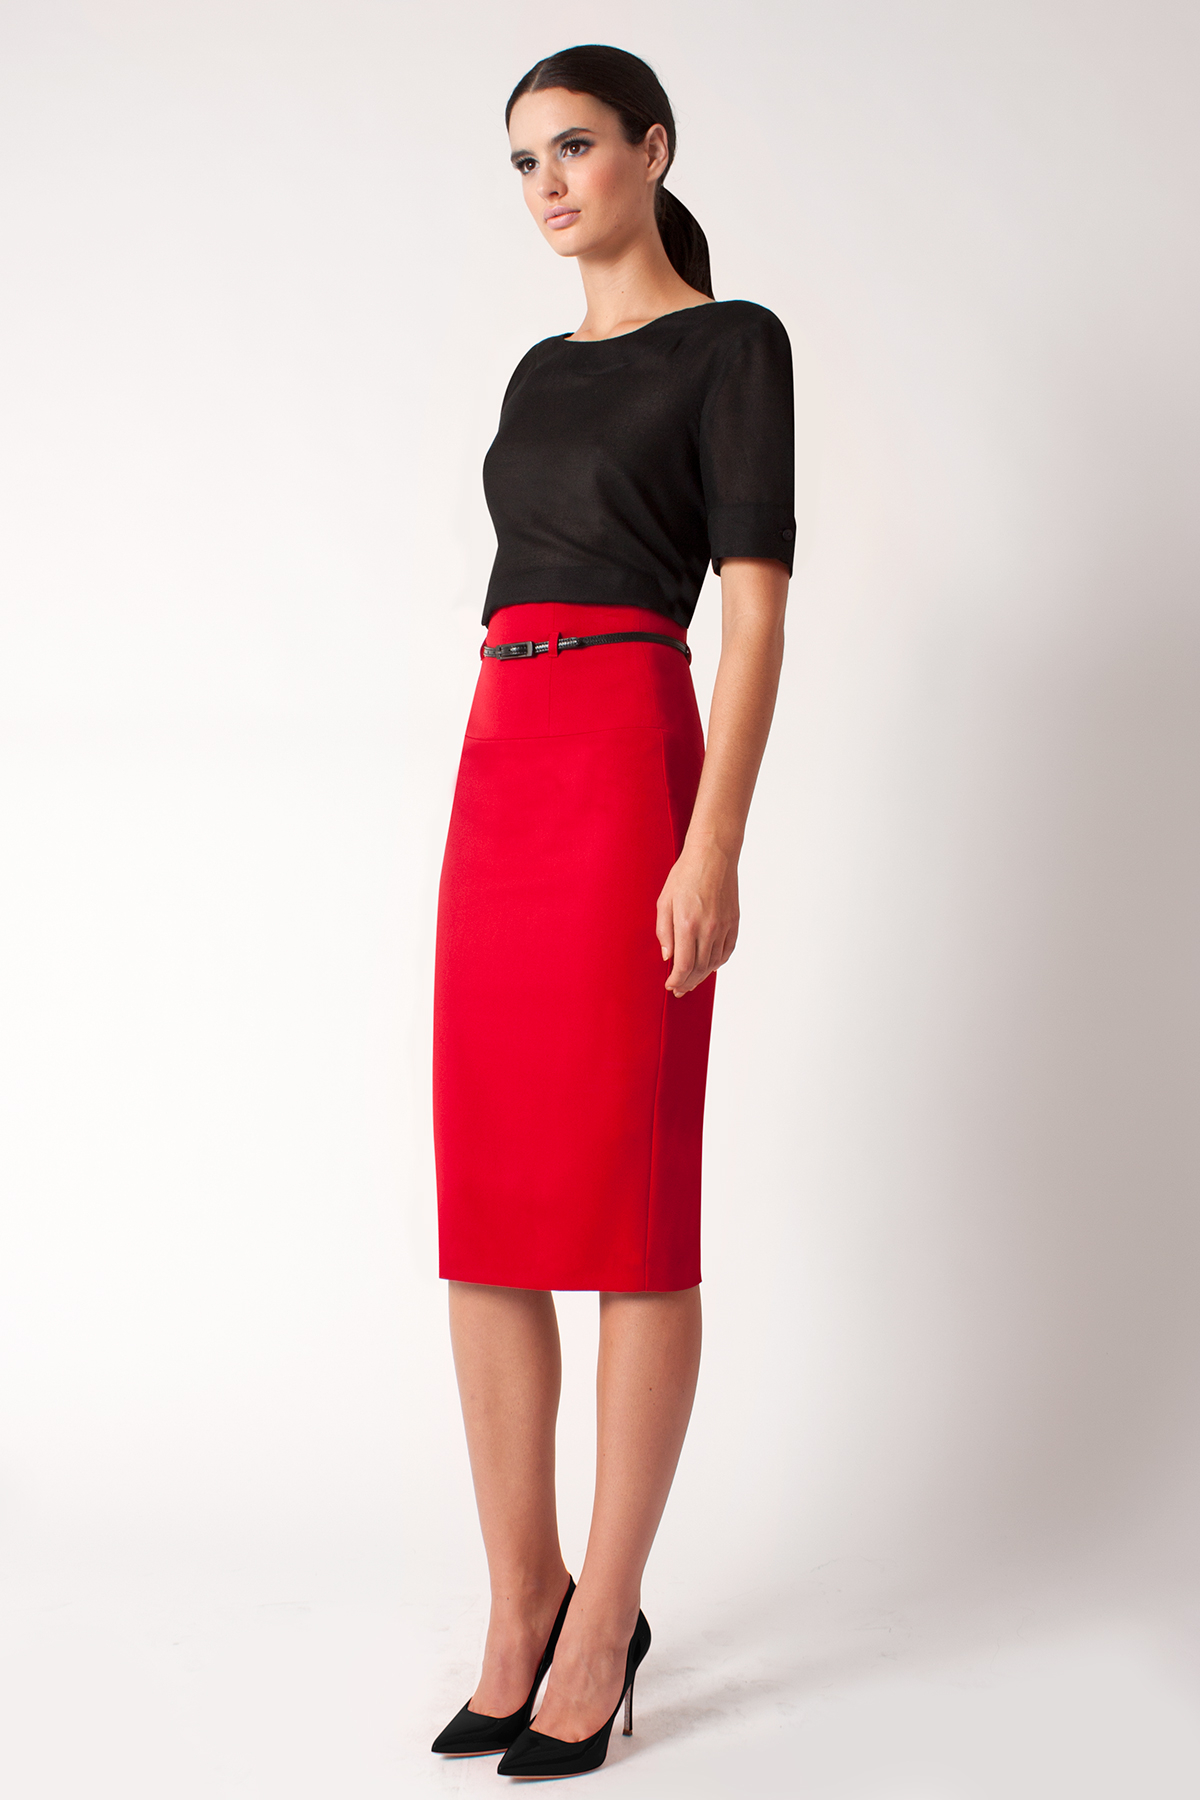 Lyst - Black Halo High Waist Pencil Skirt *online ... - photo#7